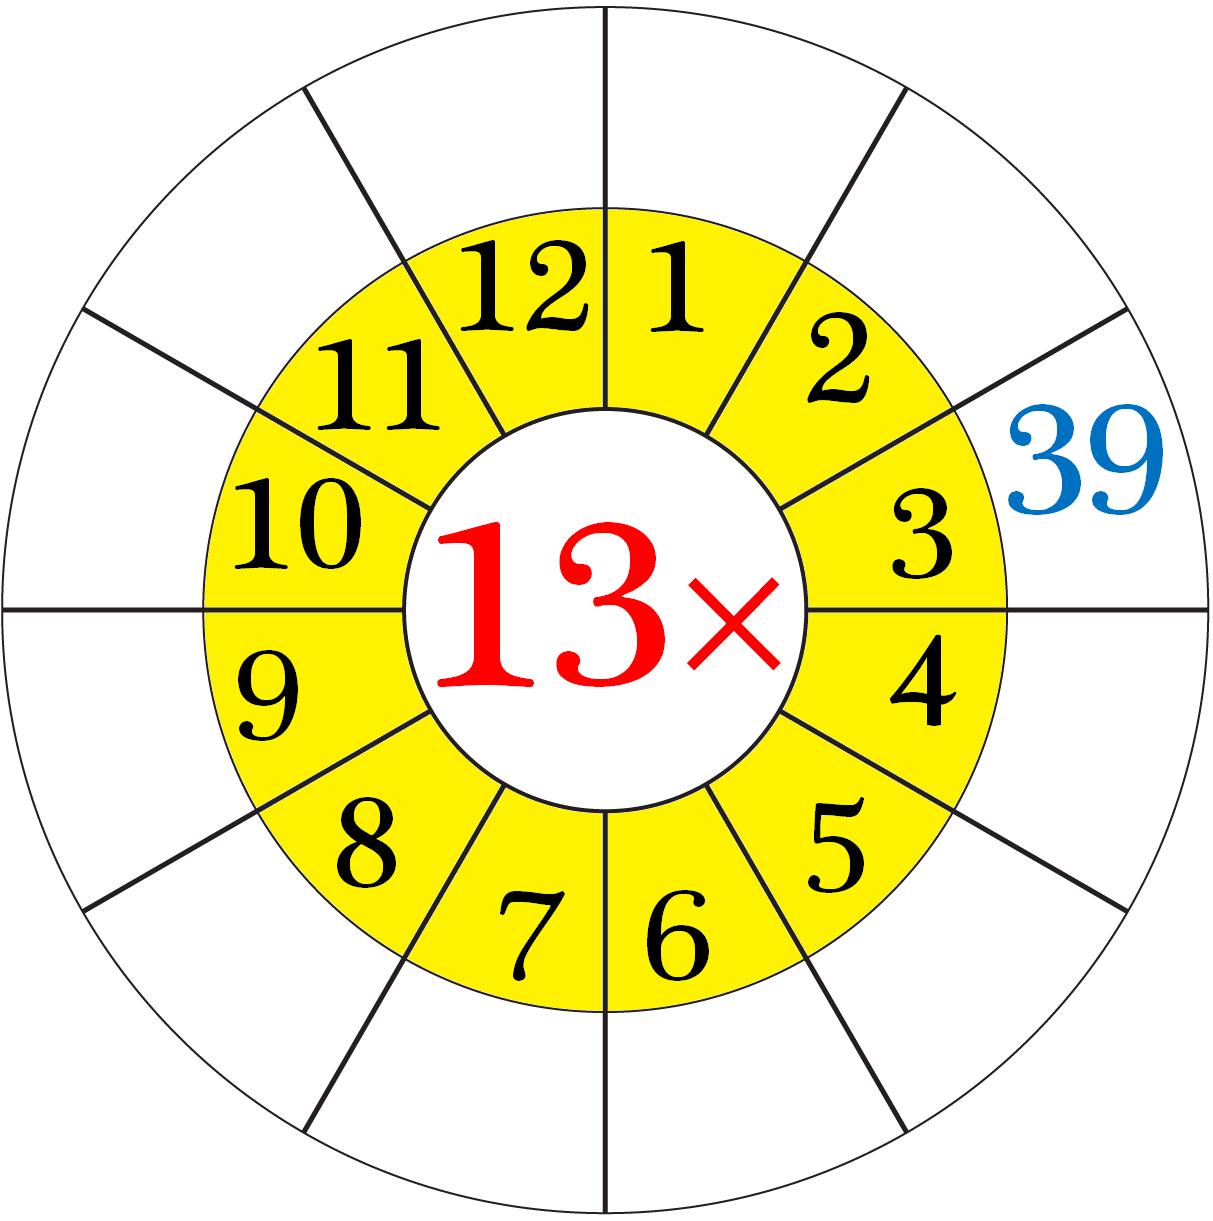 13 Times Multiplication Table Sheet